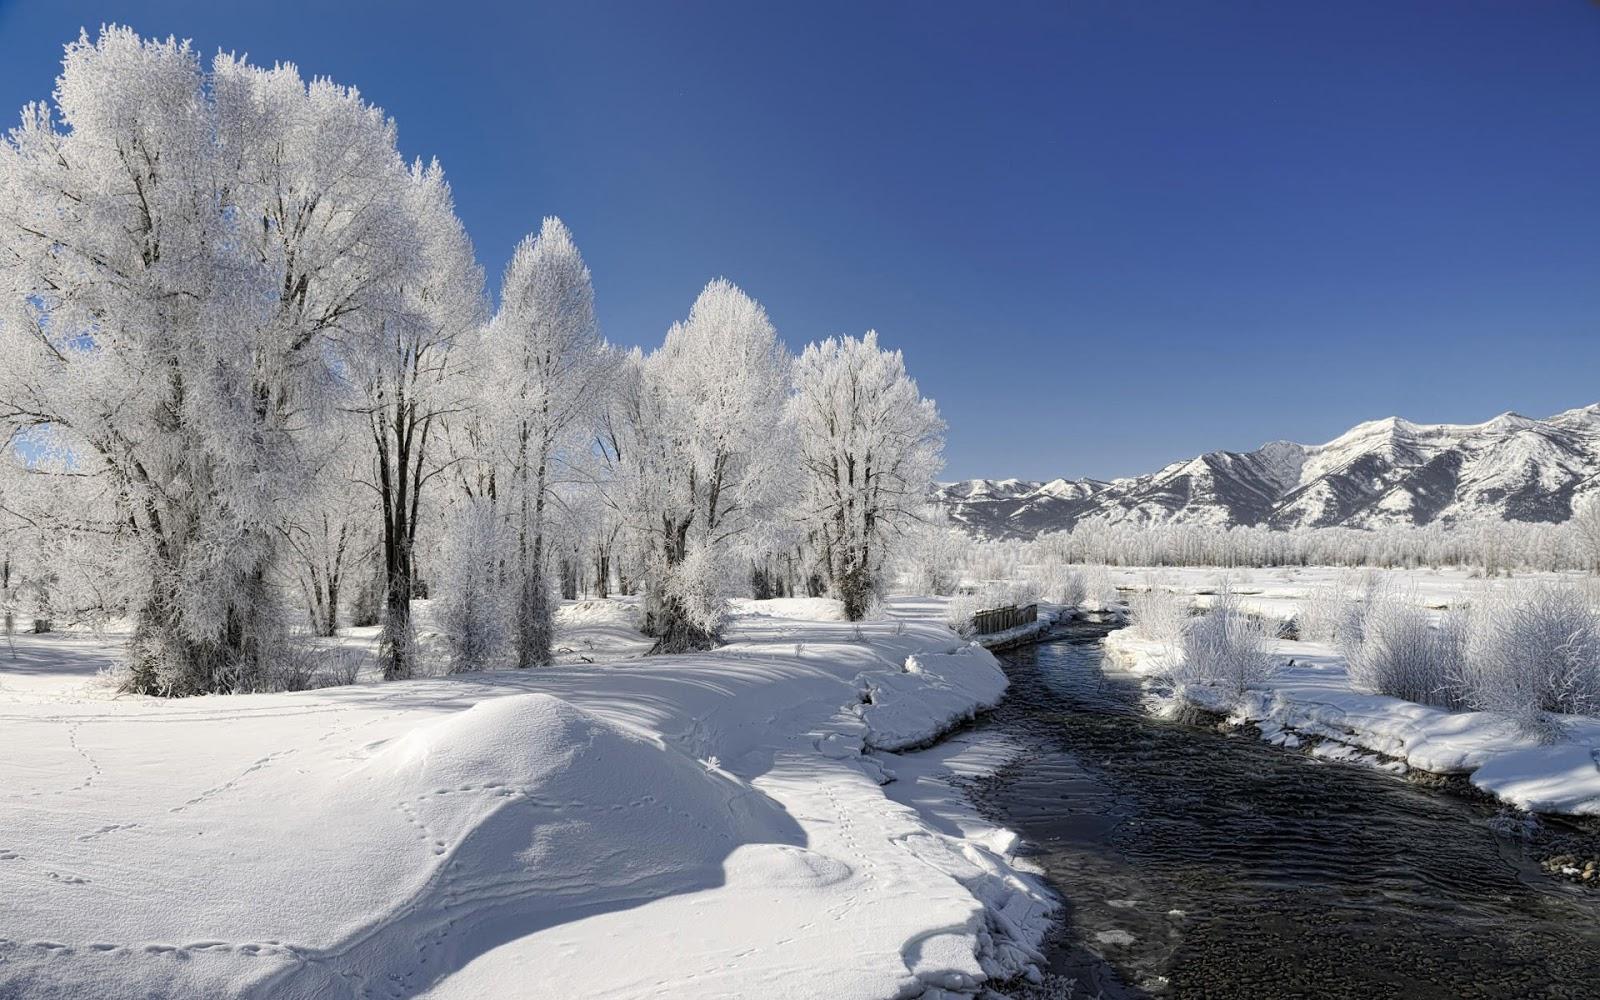 winter-Beautiful-Winter-Beauty-of-Winter-season-Nature-wallpaper-wp4210706